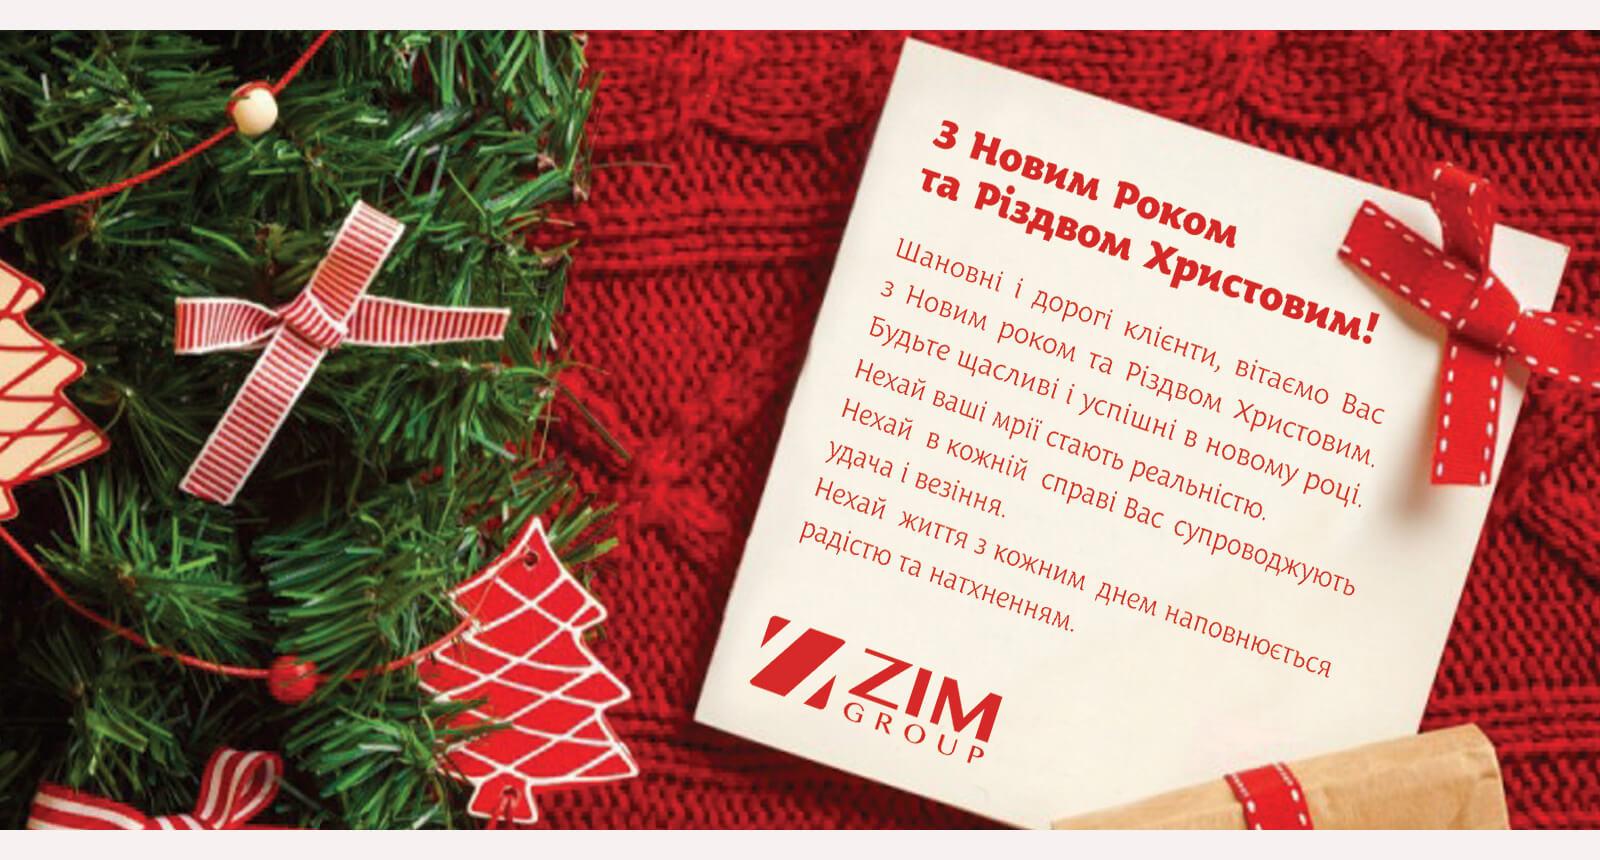 news2018-klients-ukr-small1